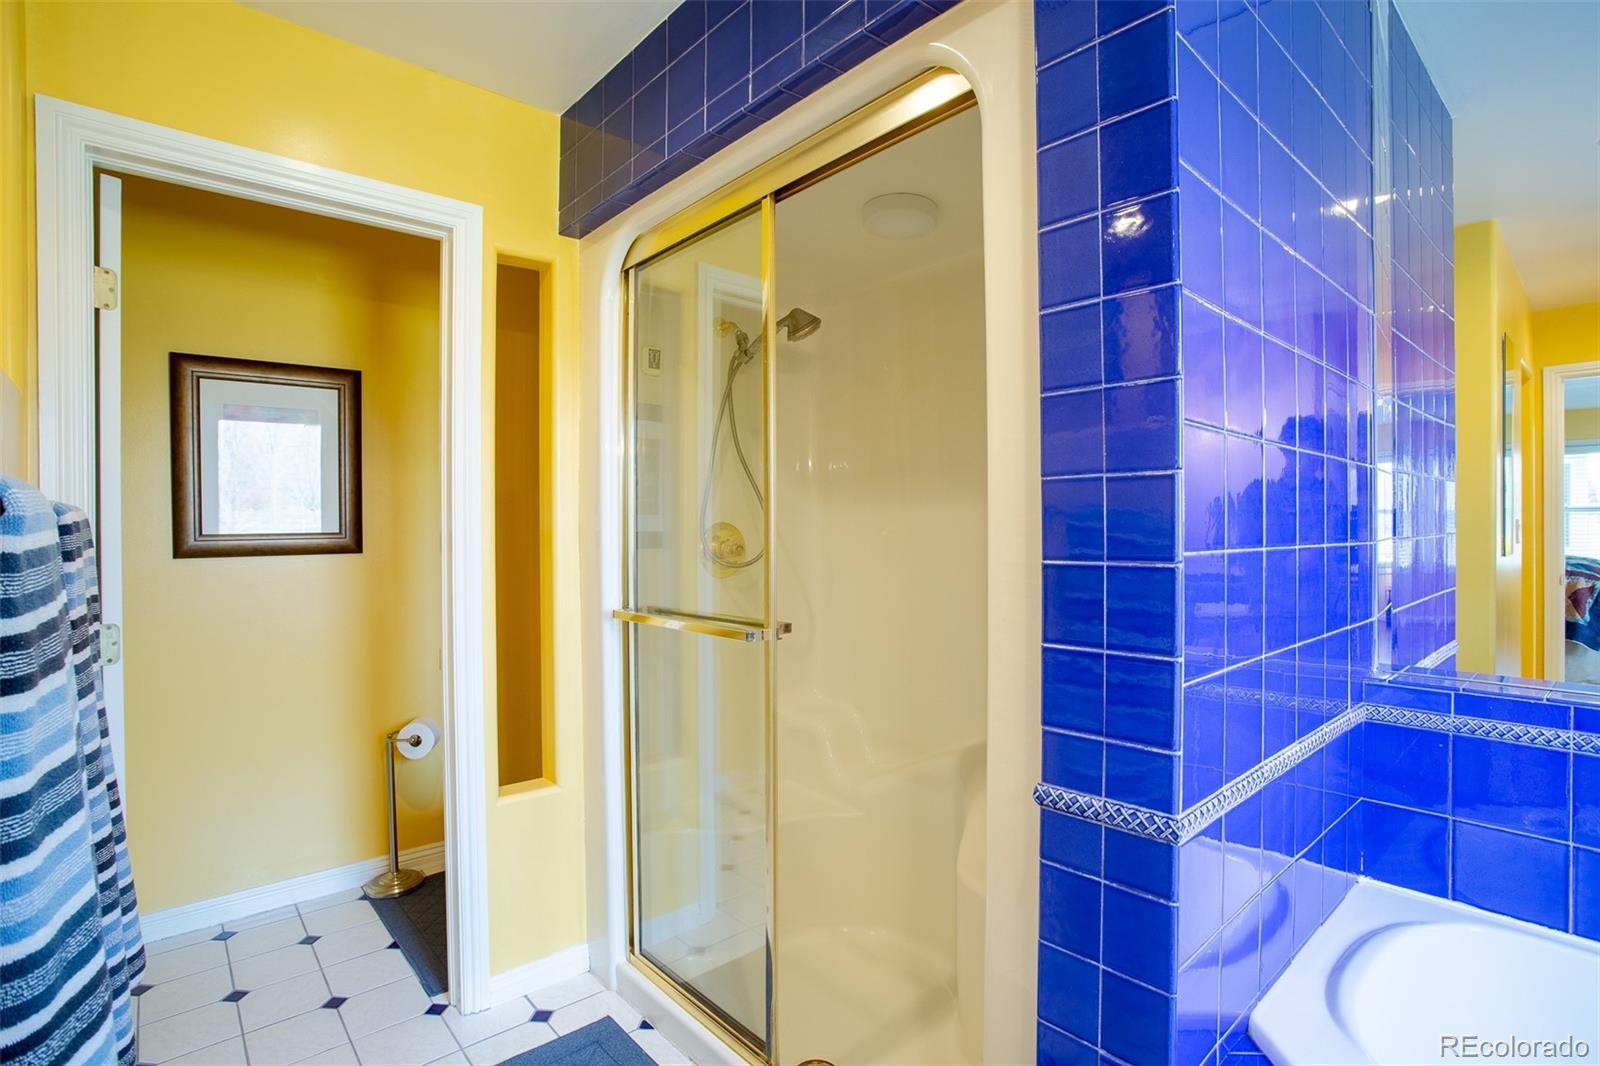 MLS# 9193779 - 23 - 7641 Estate Circle, Niwot, CO 80503